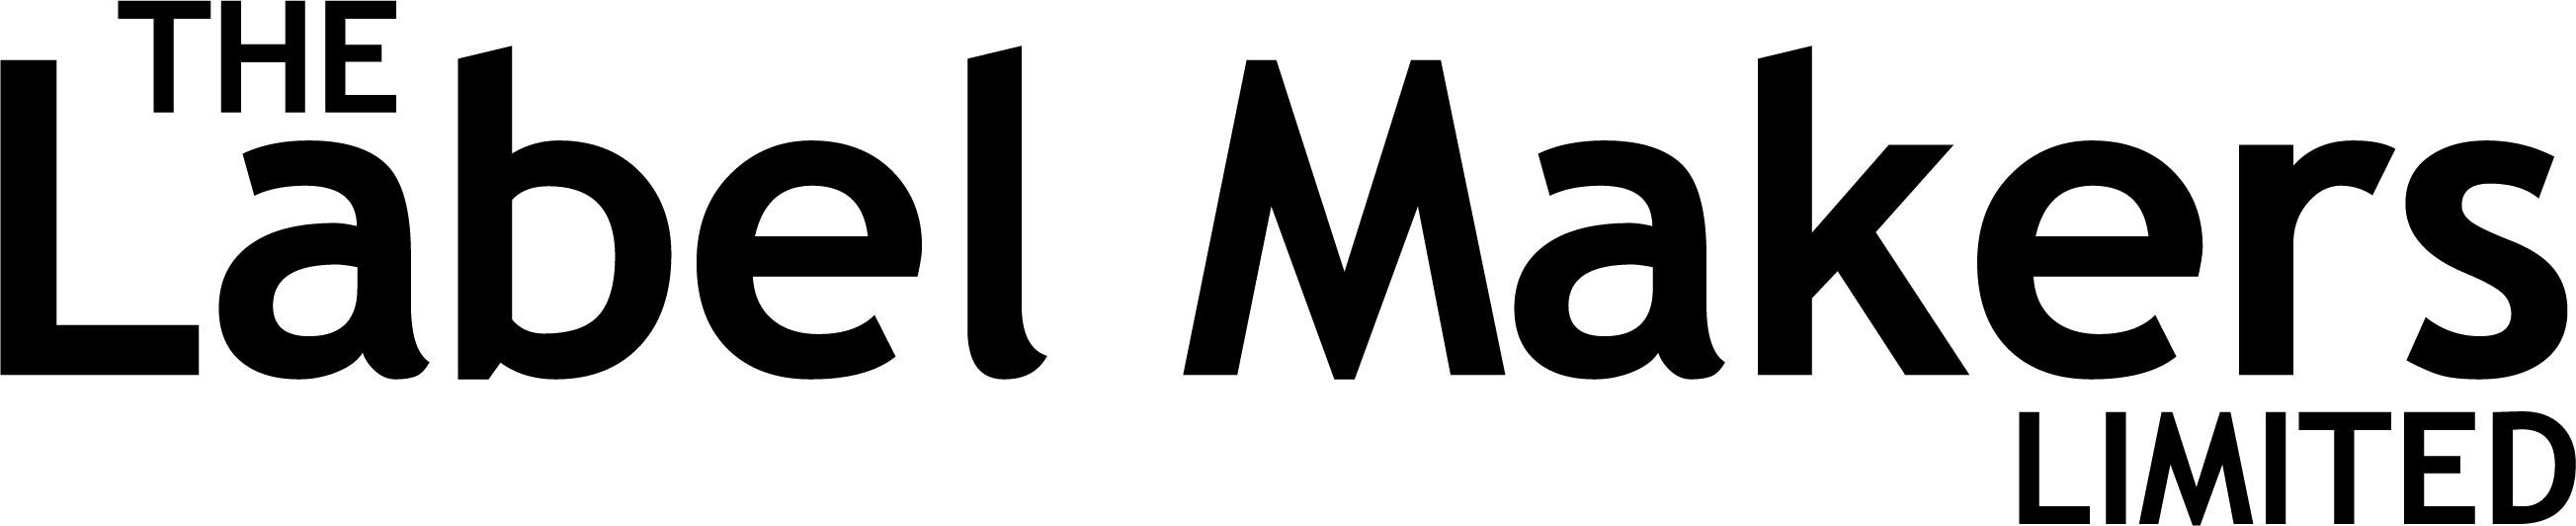 Labmak Logo Black